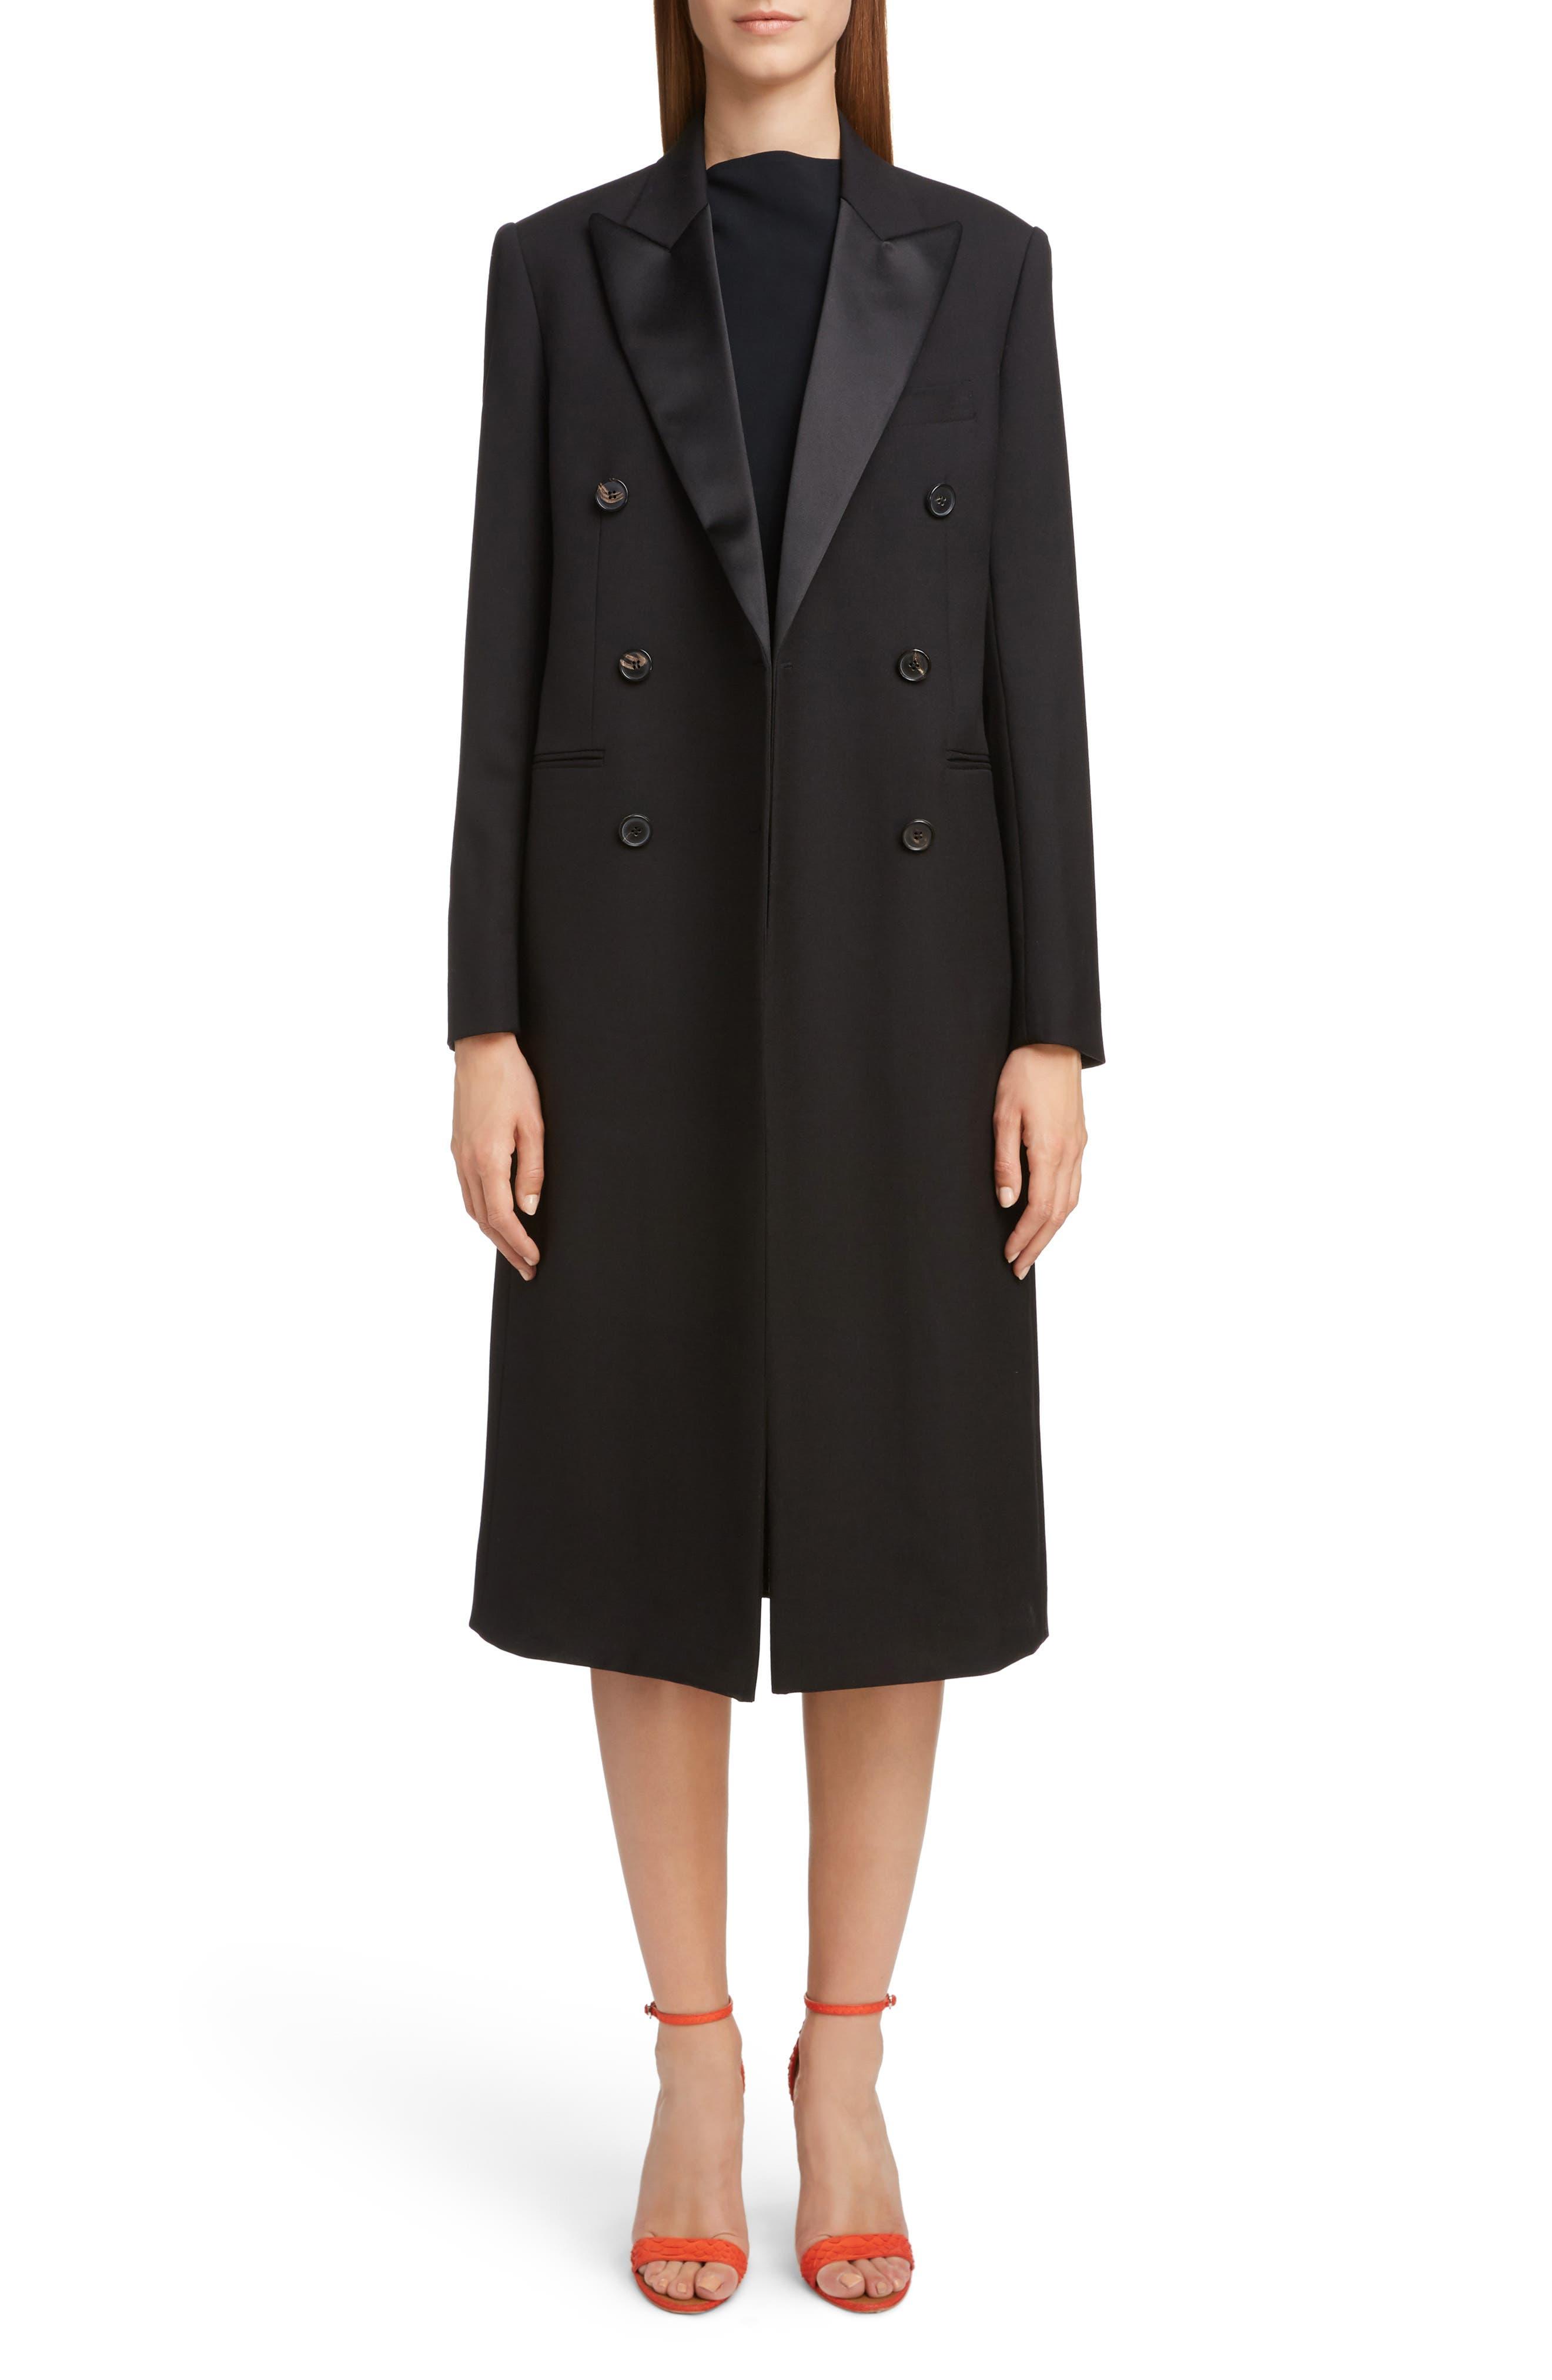 VICTORIA BECKHAM, Wool & Mohair Tuxedo Coat, Alternate thumbnail 6, color, BLACK